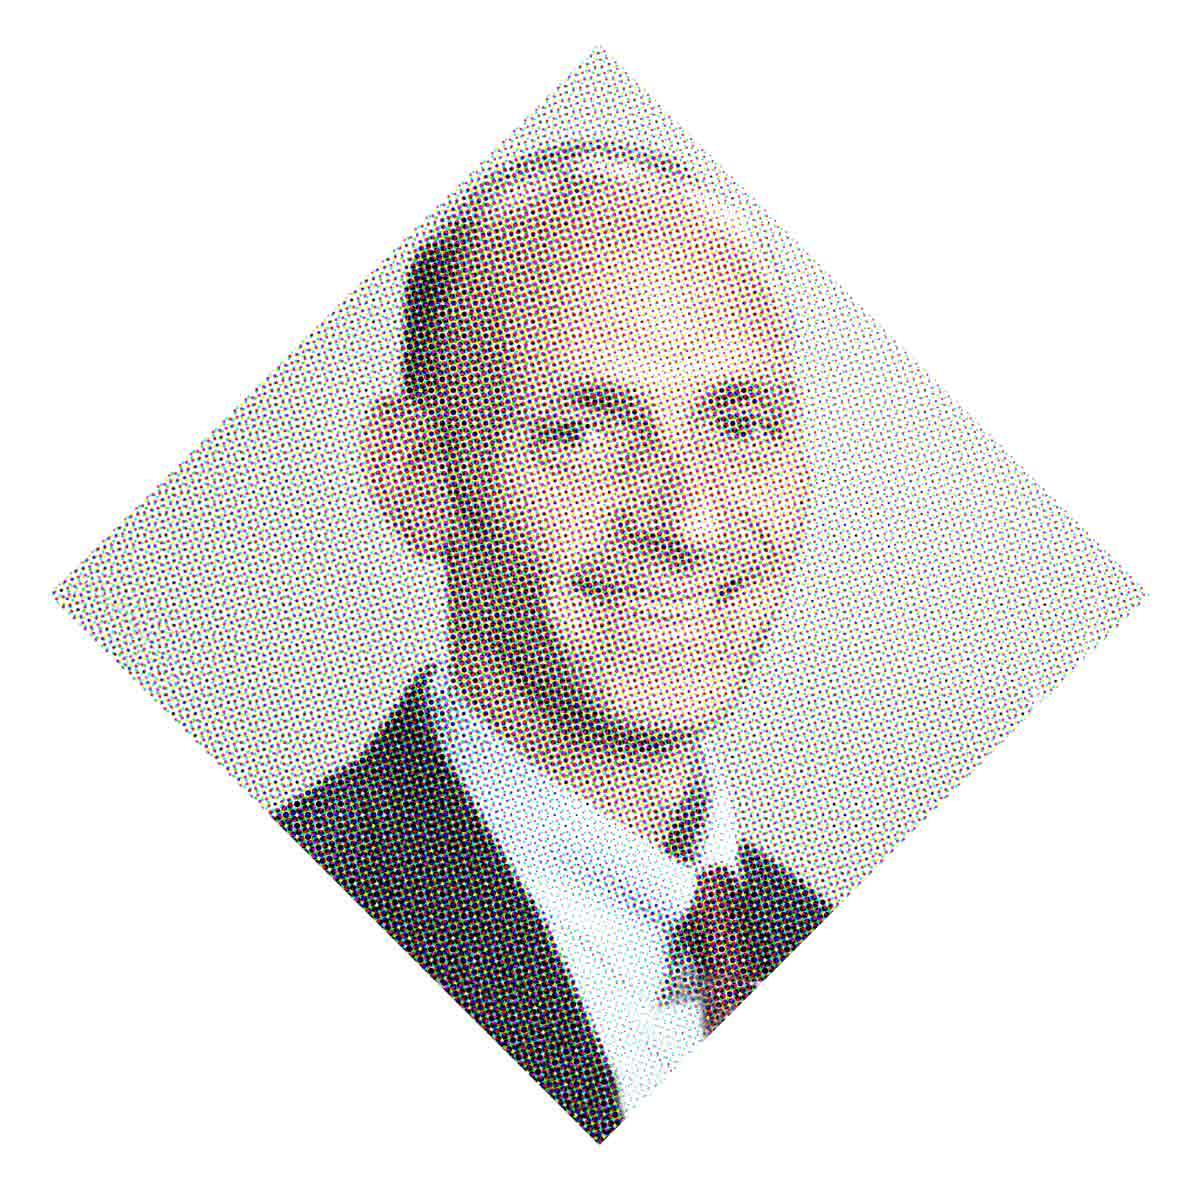 Andy Hoffman - Marketing Consultant - MimbleWimble Coin